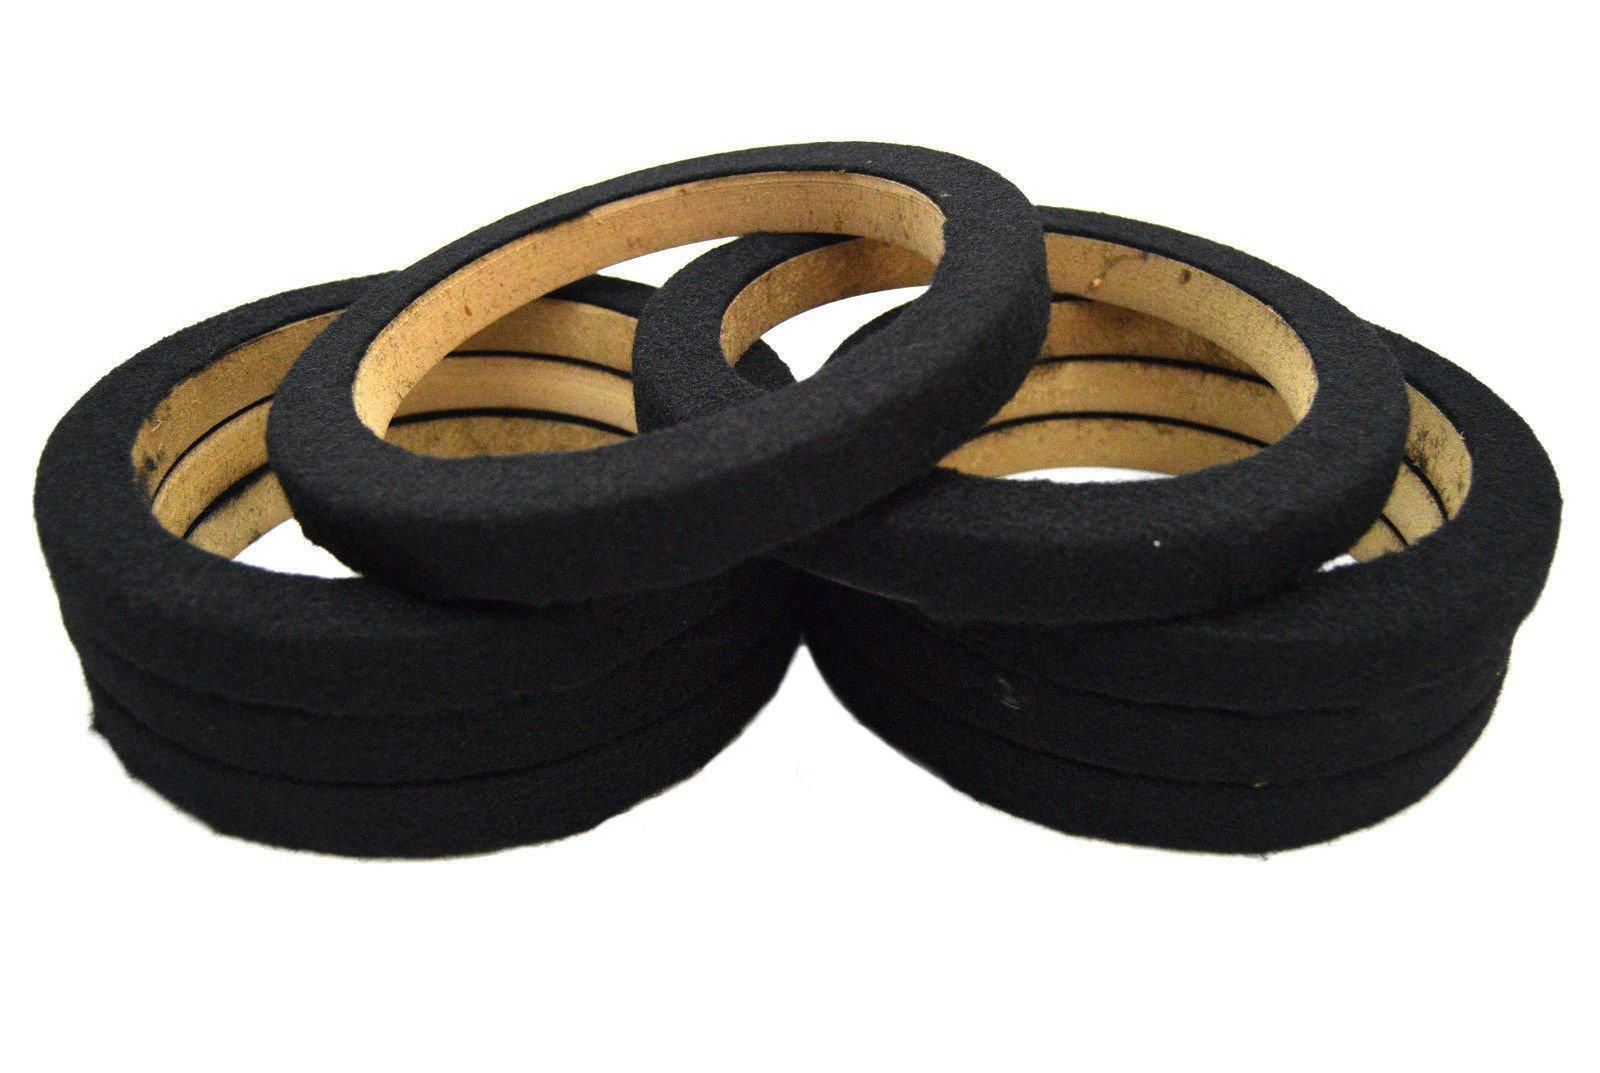 Nippon America 8 Pieces 6.5 Inch MDF Wood Speaker Spacer Rings with Black Carpet 4 Pair